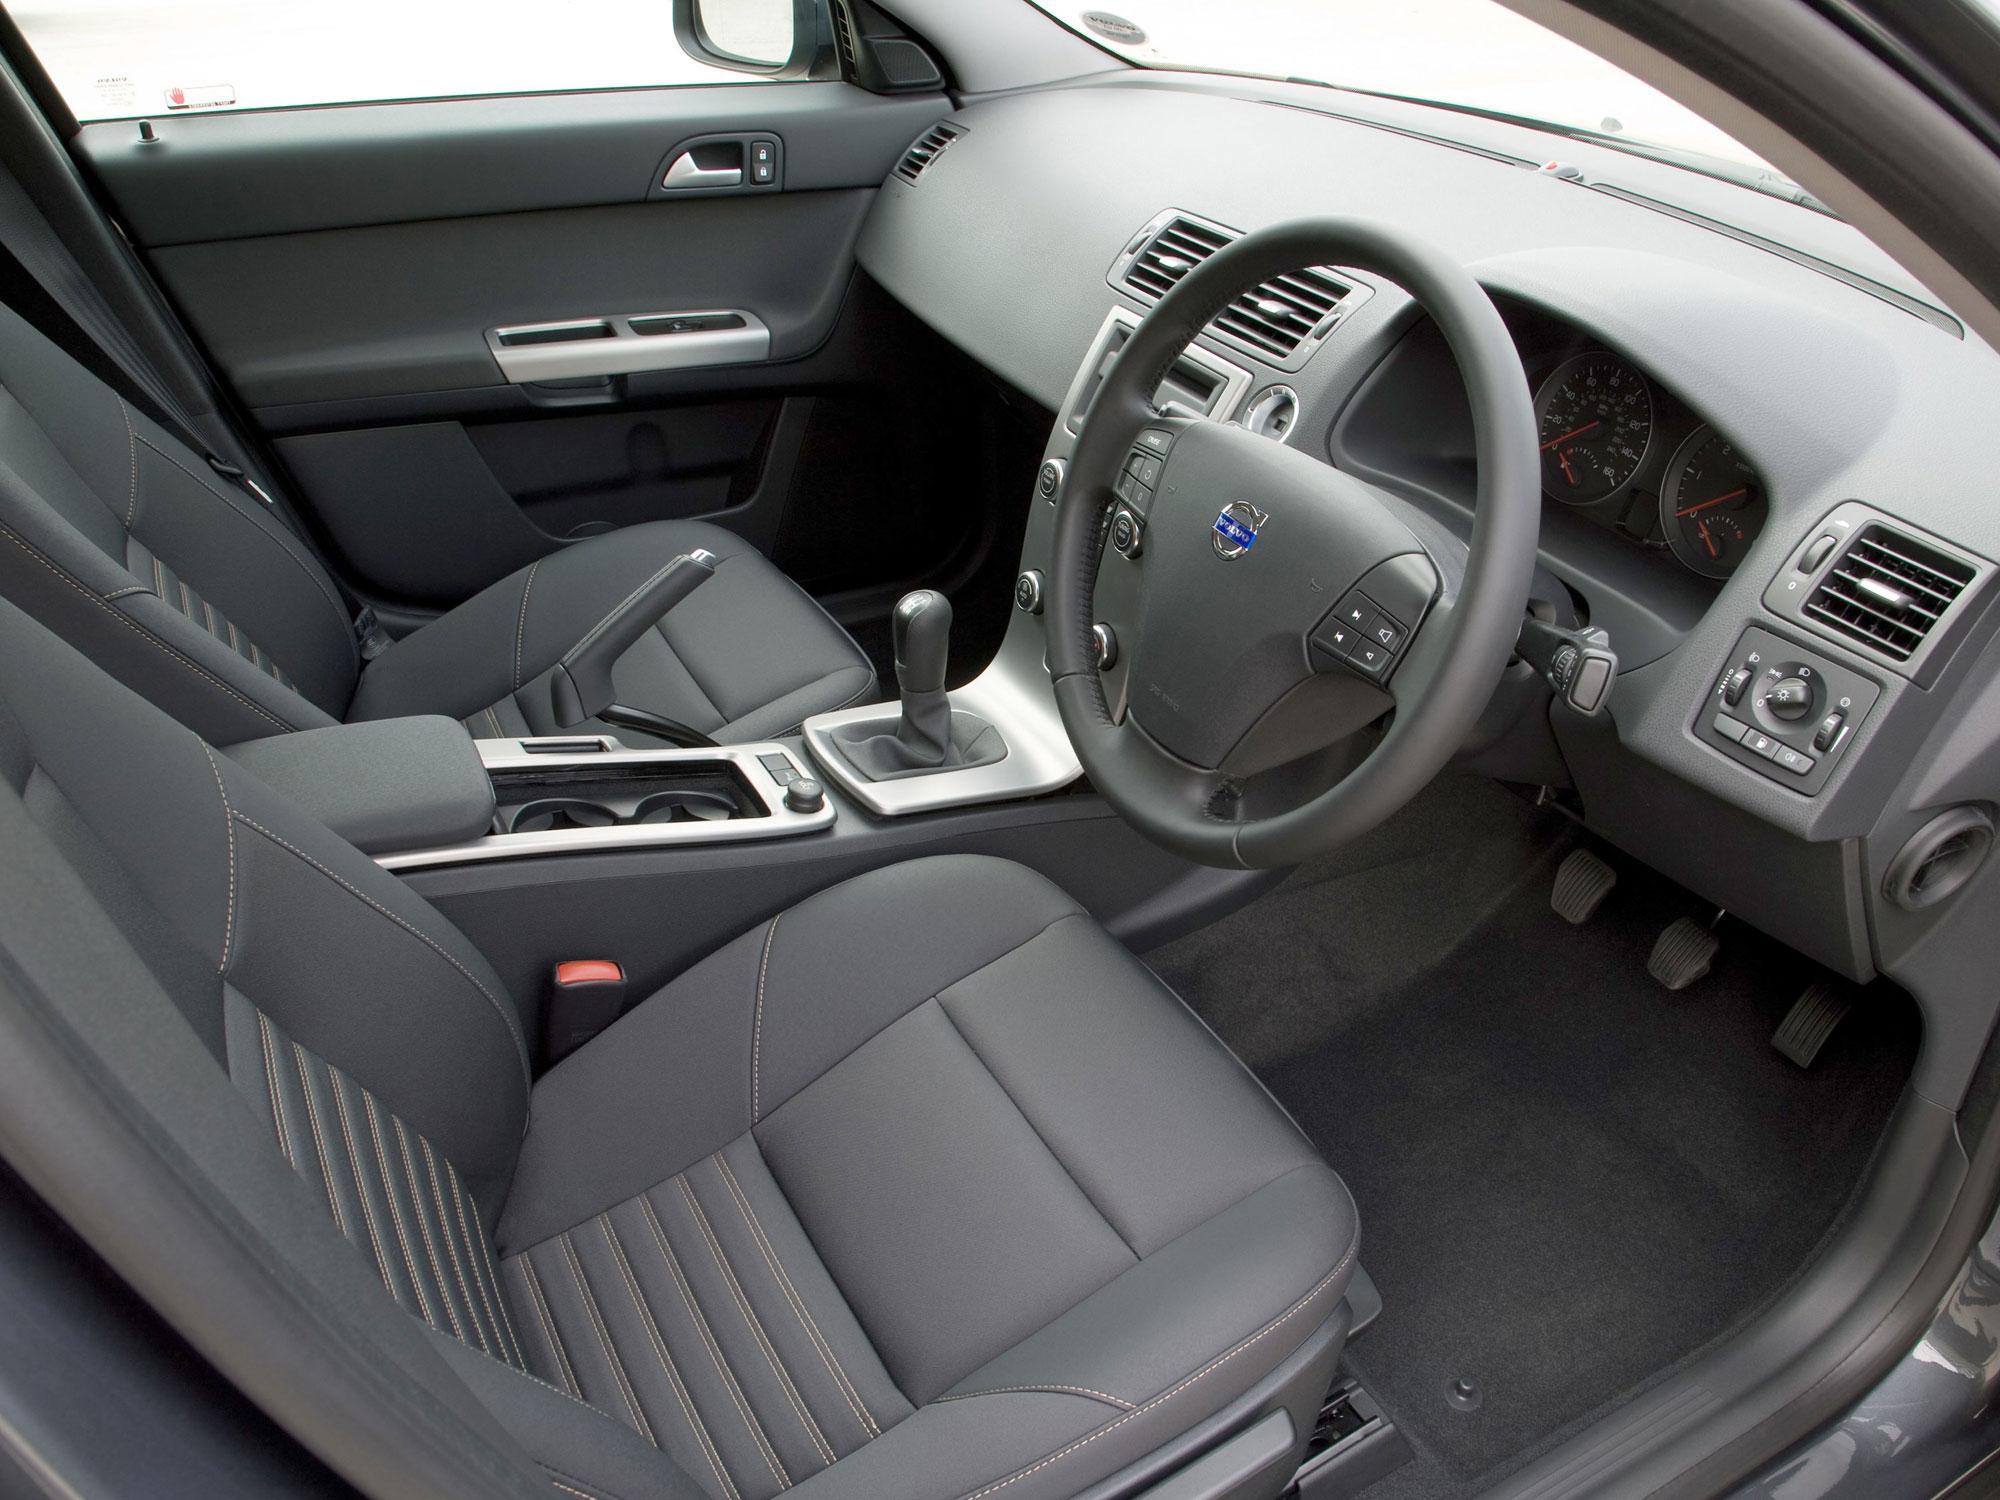 Volvo-C30-08.jpg